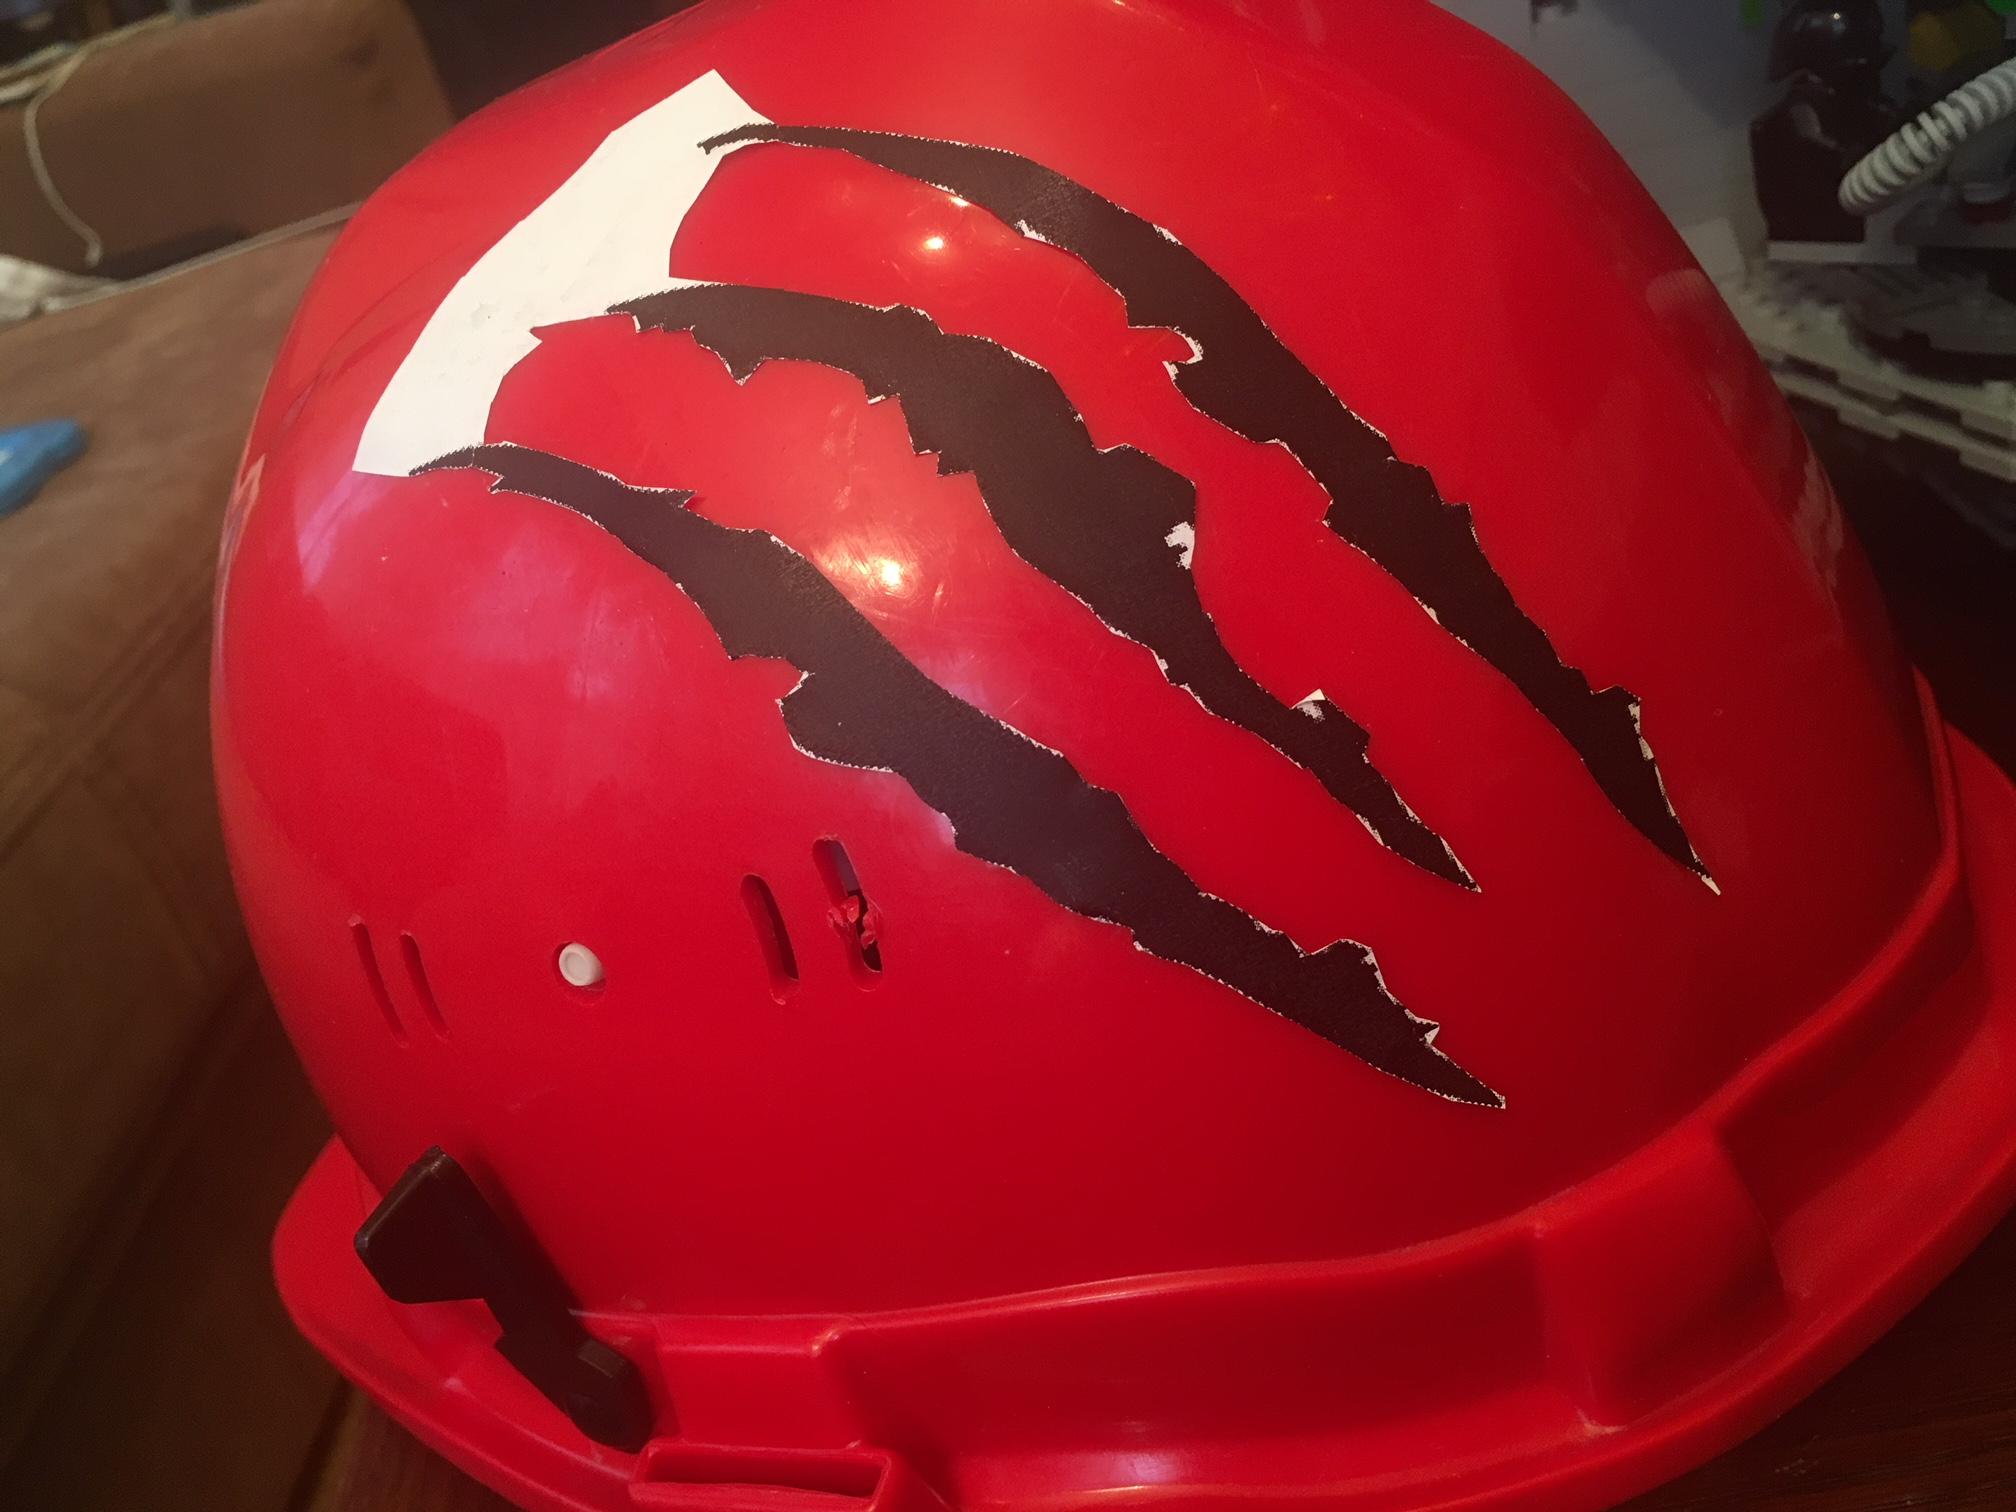 szmk_diy_jurassic_park_helmet_jurassic_world_sisak_6.JPG